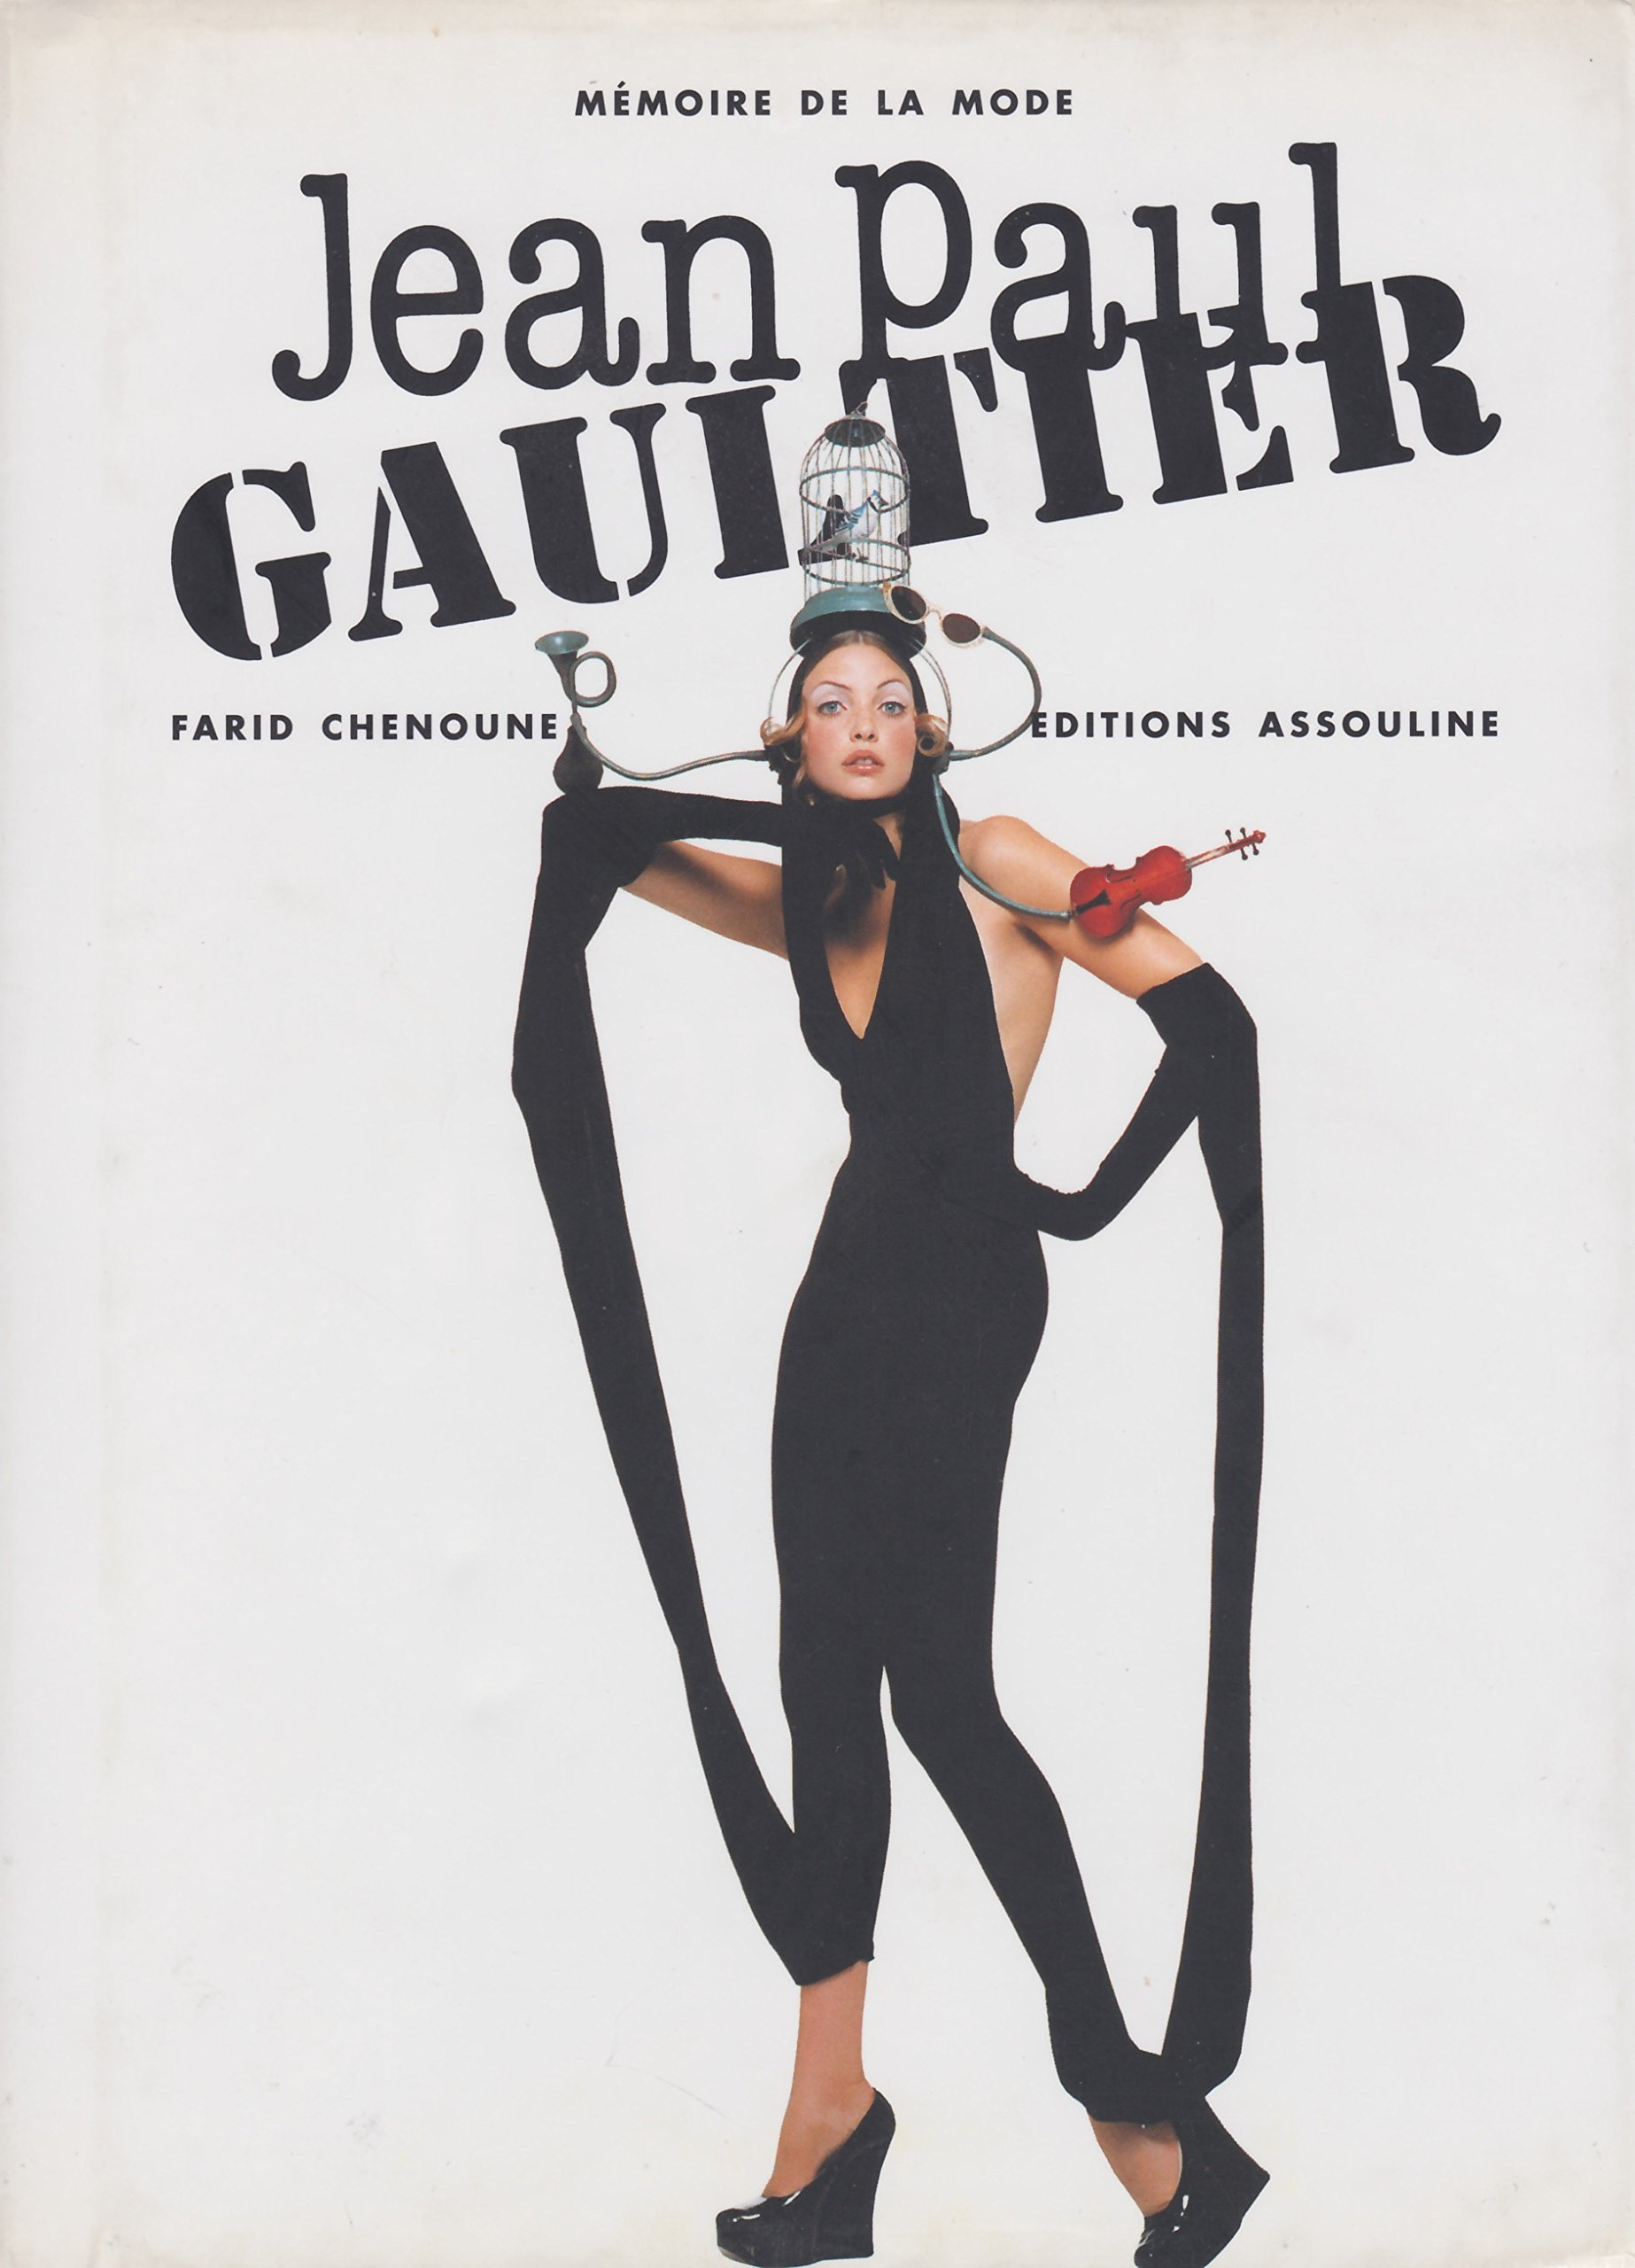 Chenoune Livres Farid Jean Gaultier Paul hrCtdsQ